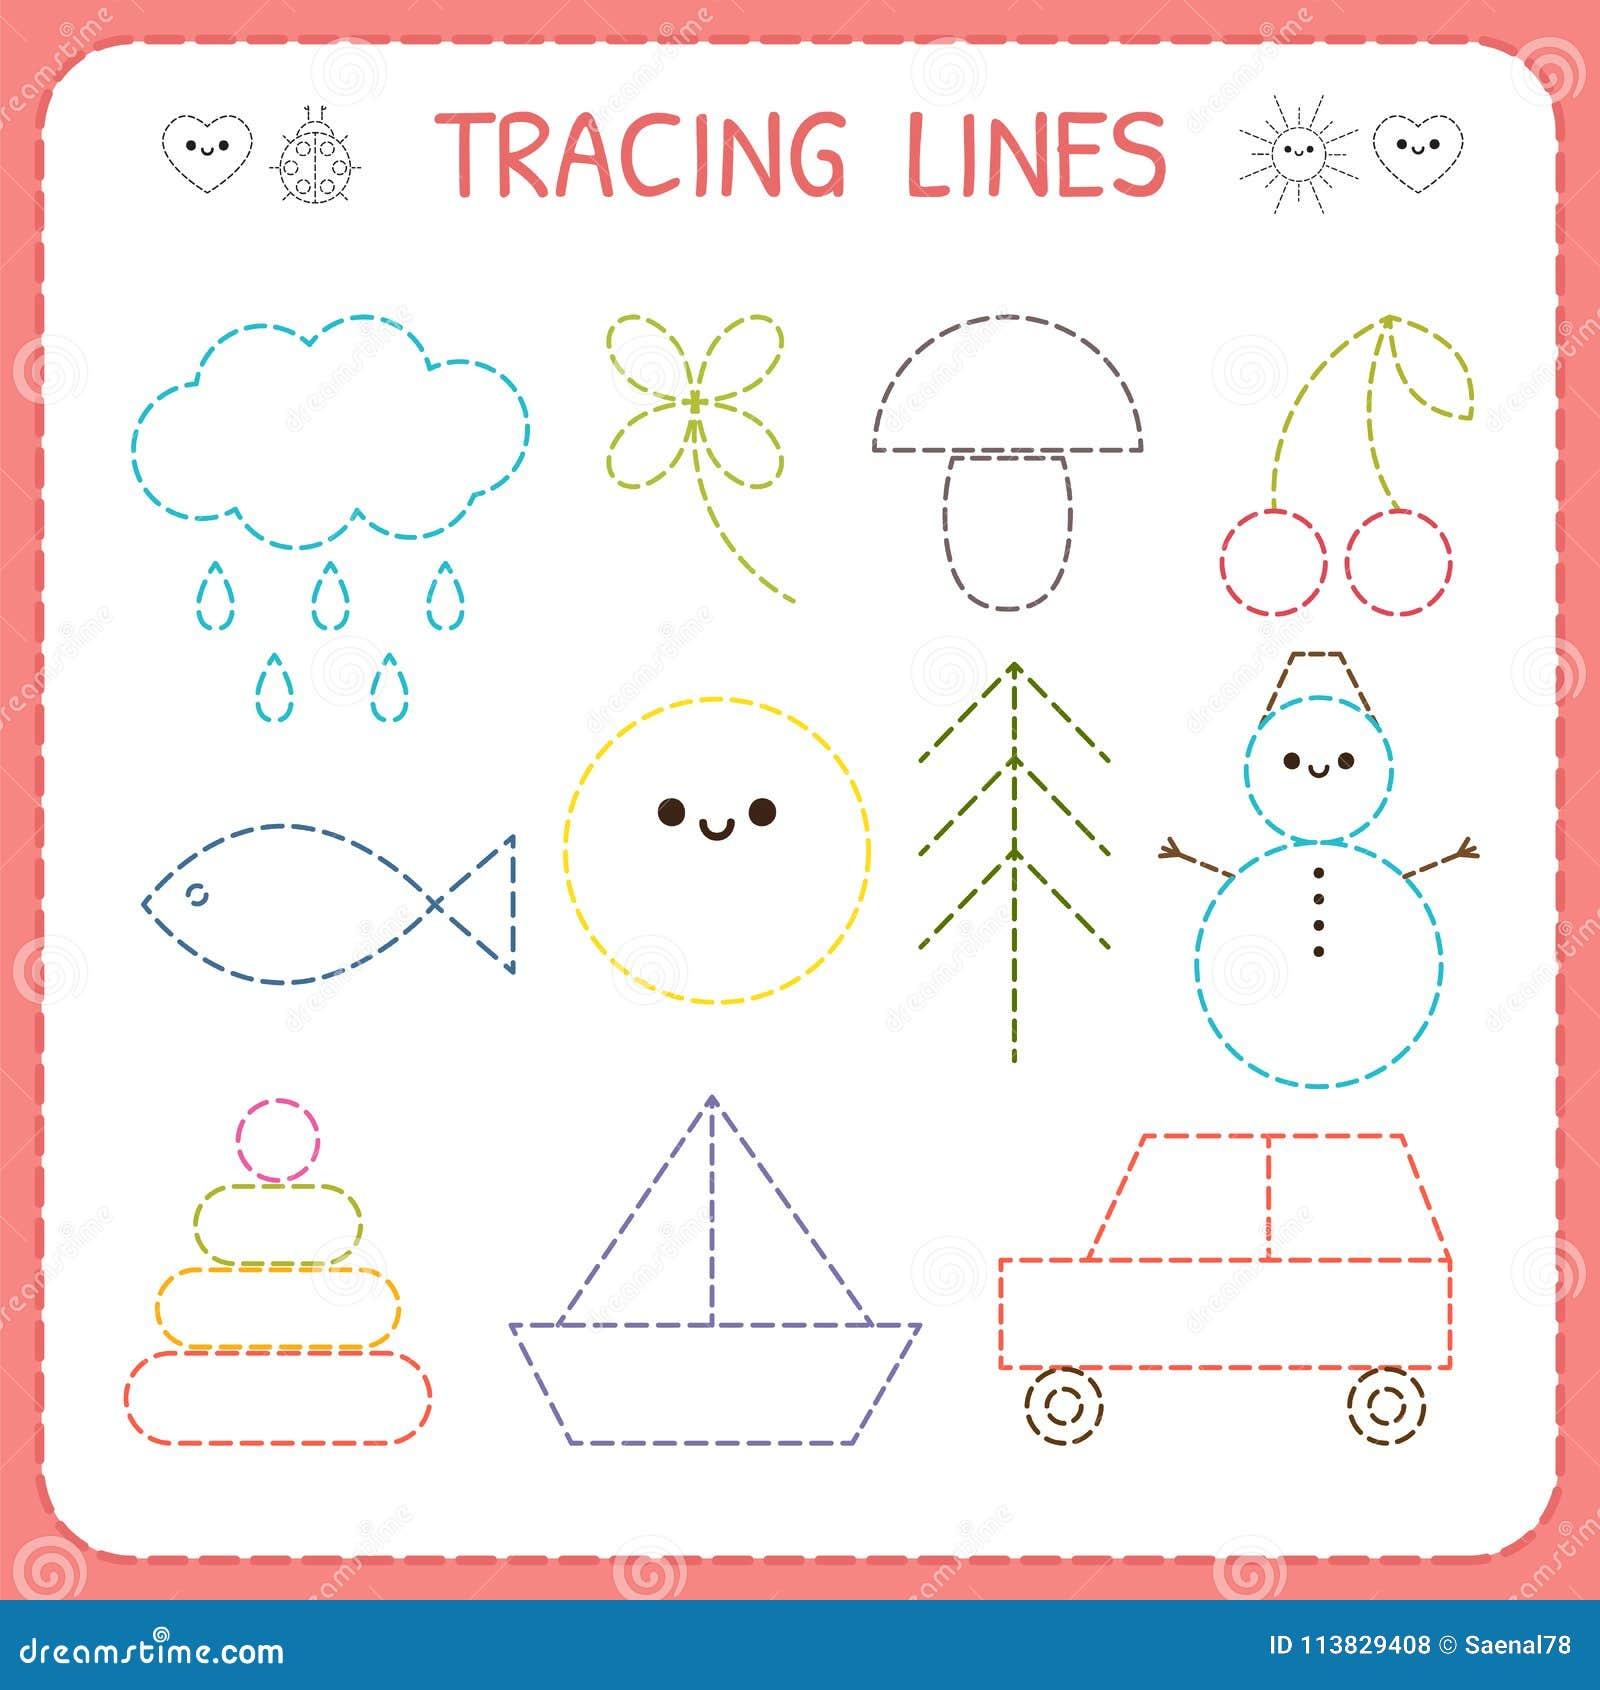 Standing Line Worksheets For Kindergarten